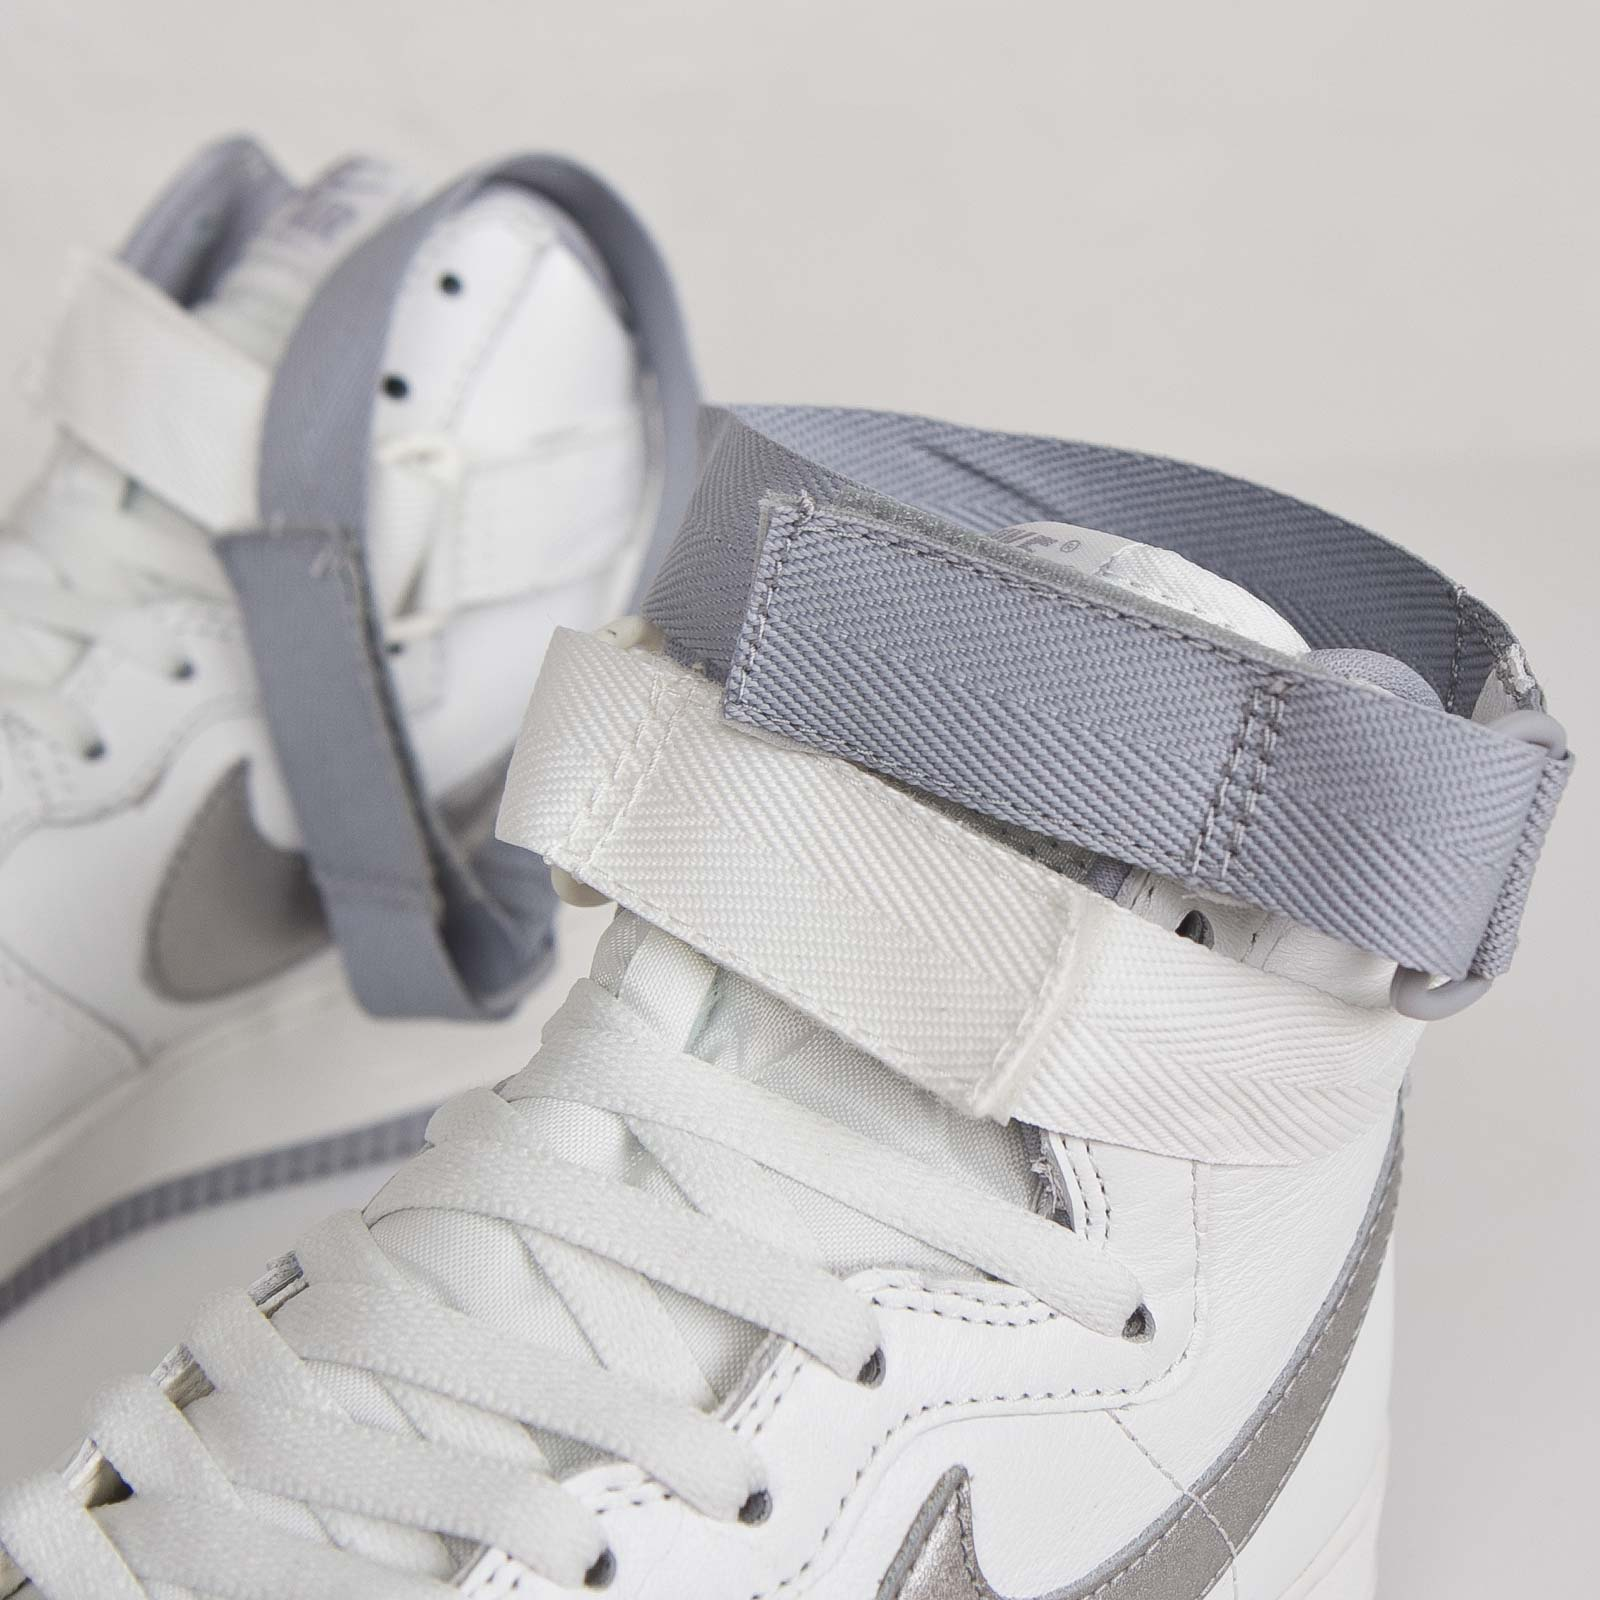 Nike Air Force 1 Hi Retro QS 743546 101 Sneakersnstuff